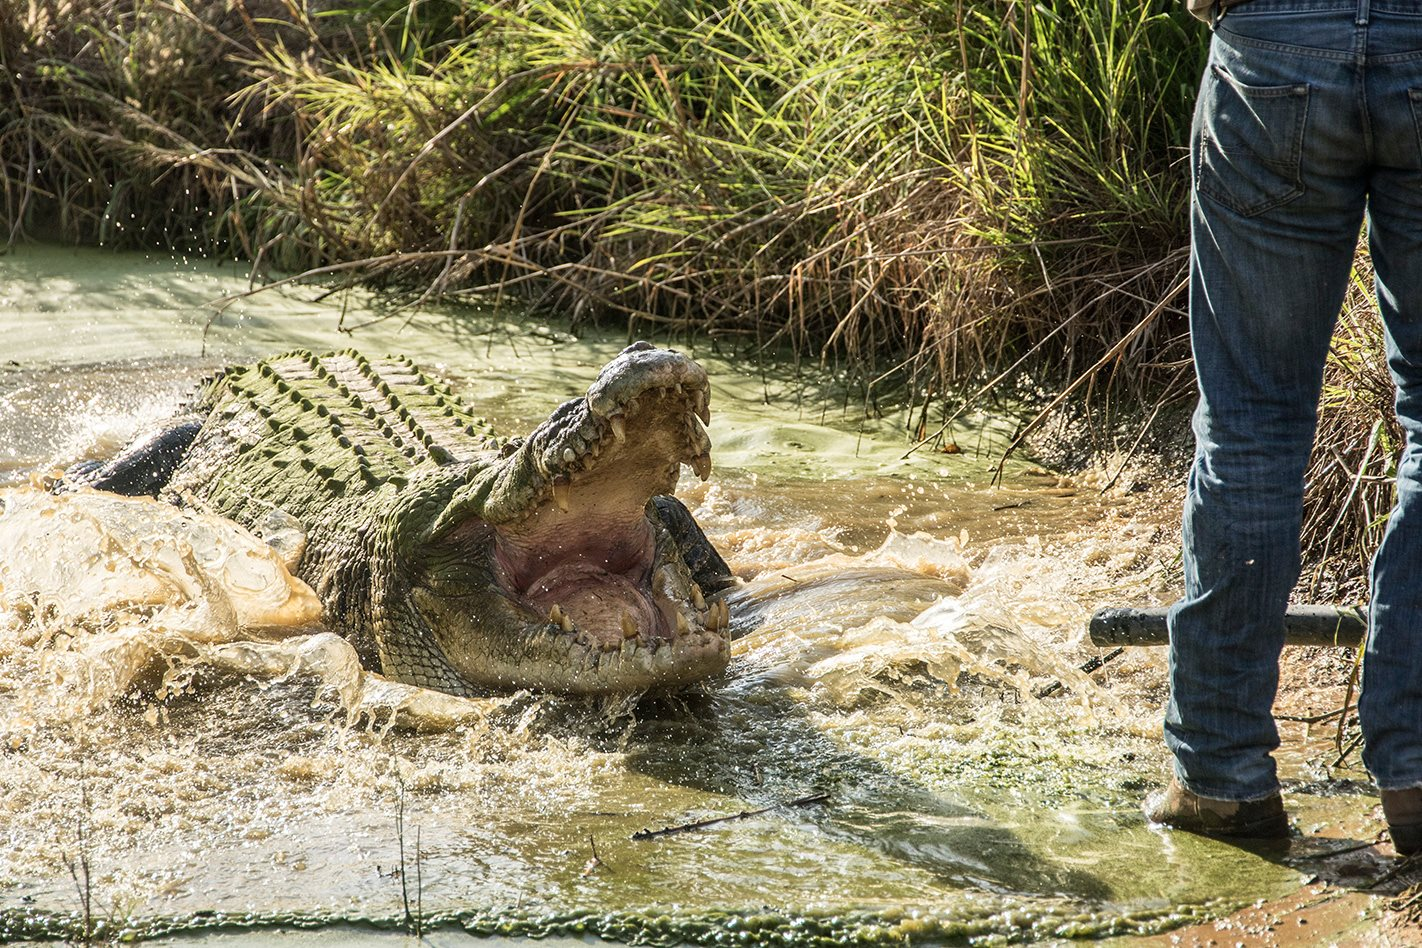 outback wrangler saltie crocs